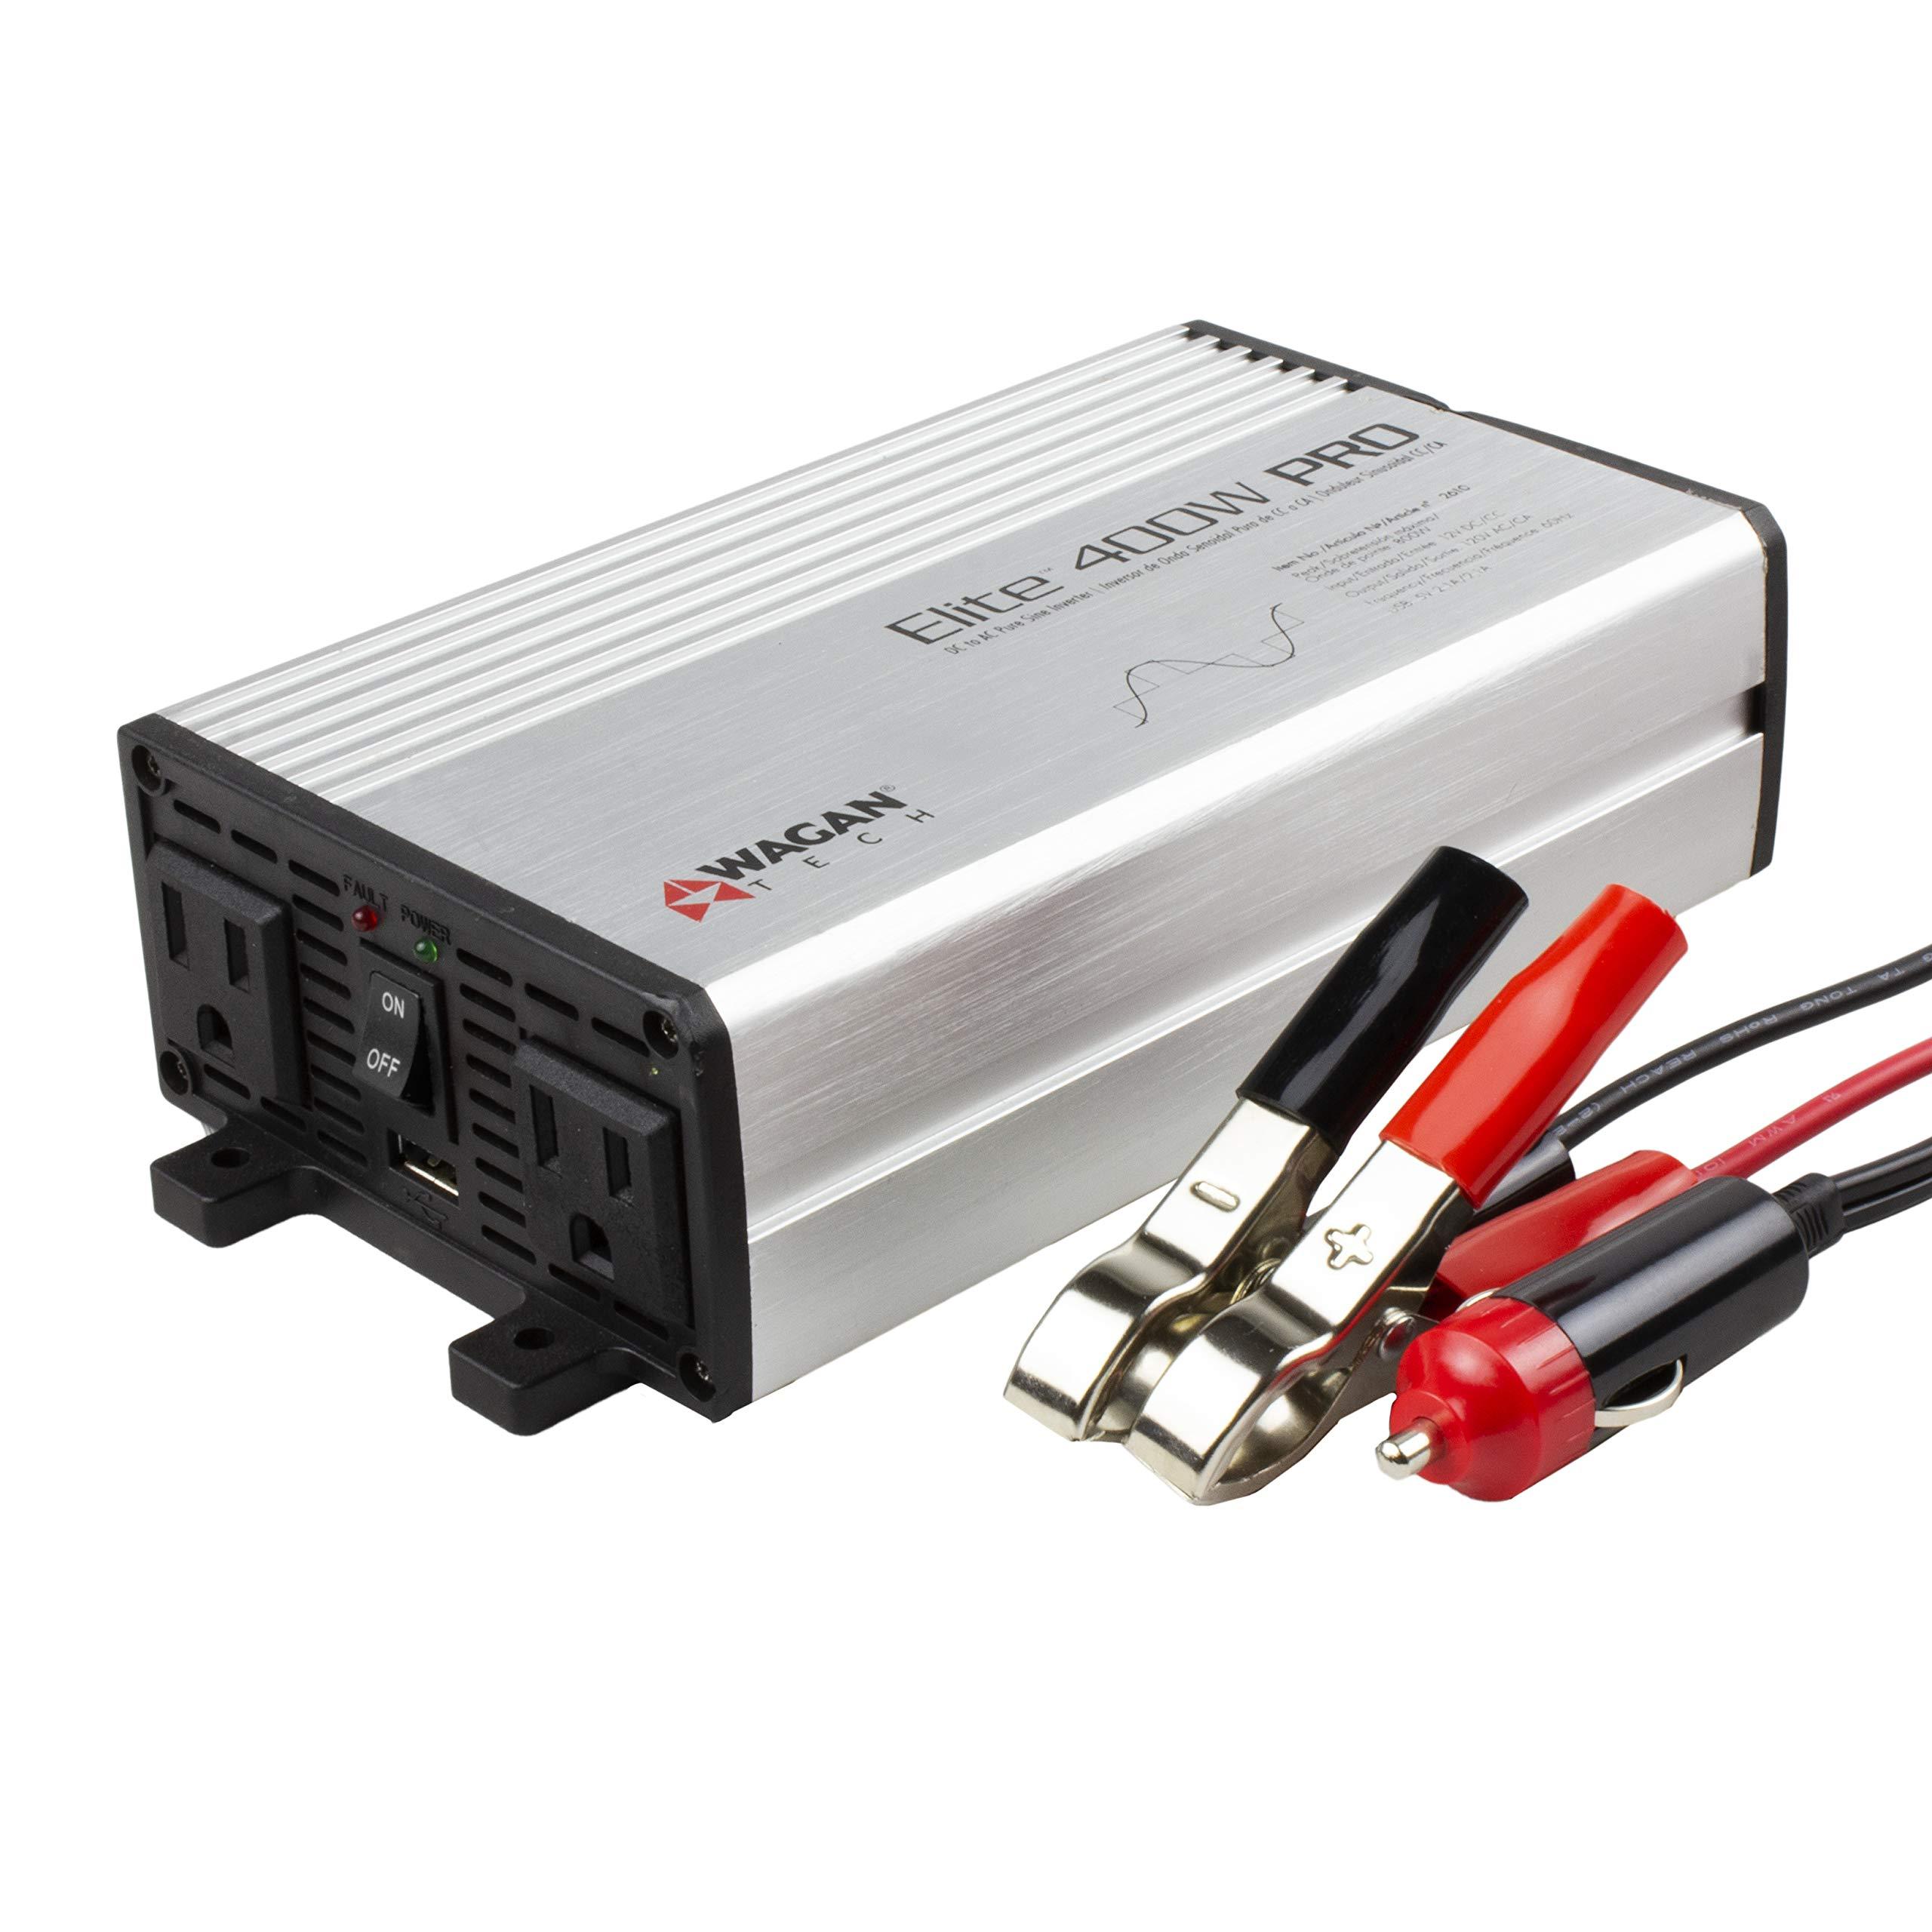 Wagan EL2610 Gray 400W Pro Pure Sine Wave Power Inverter